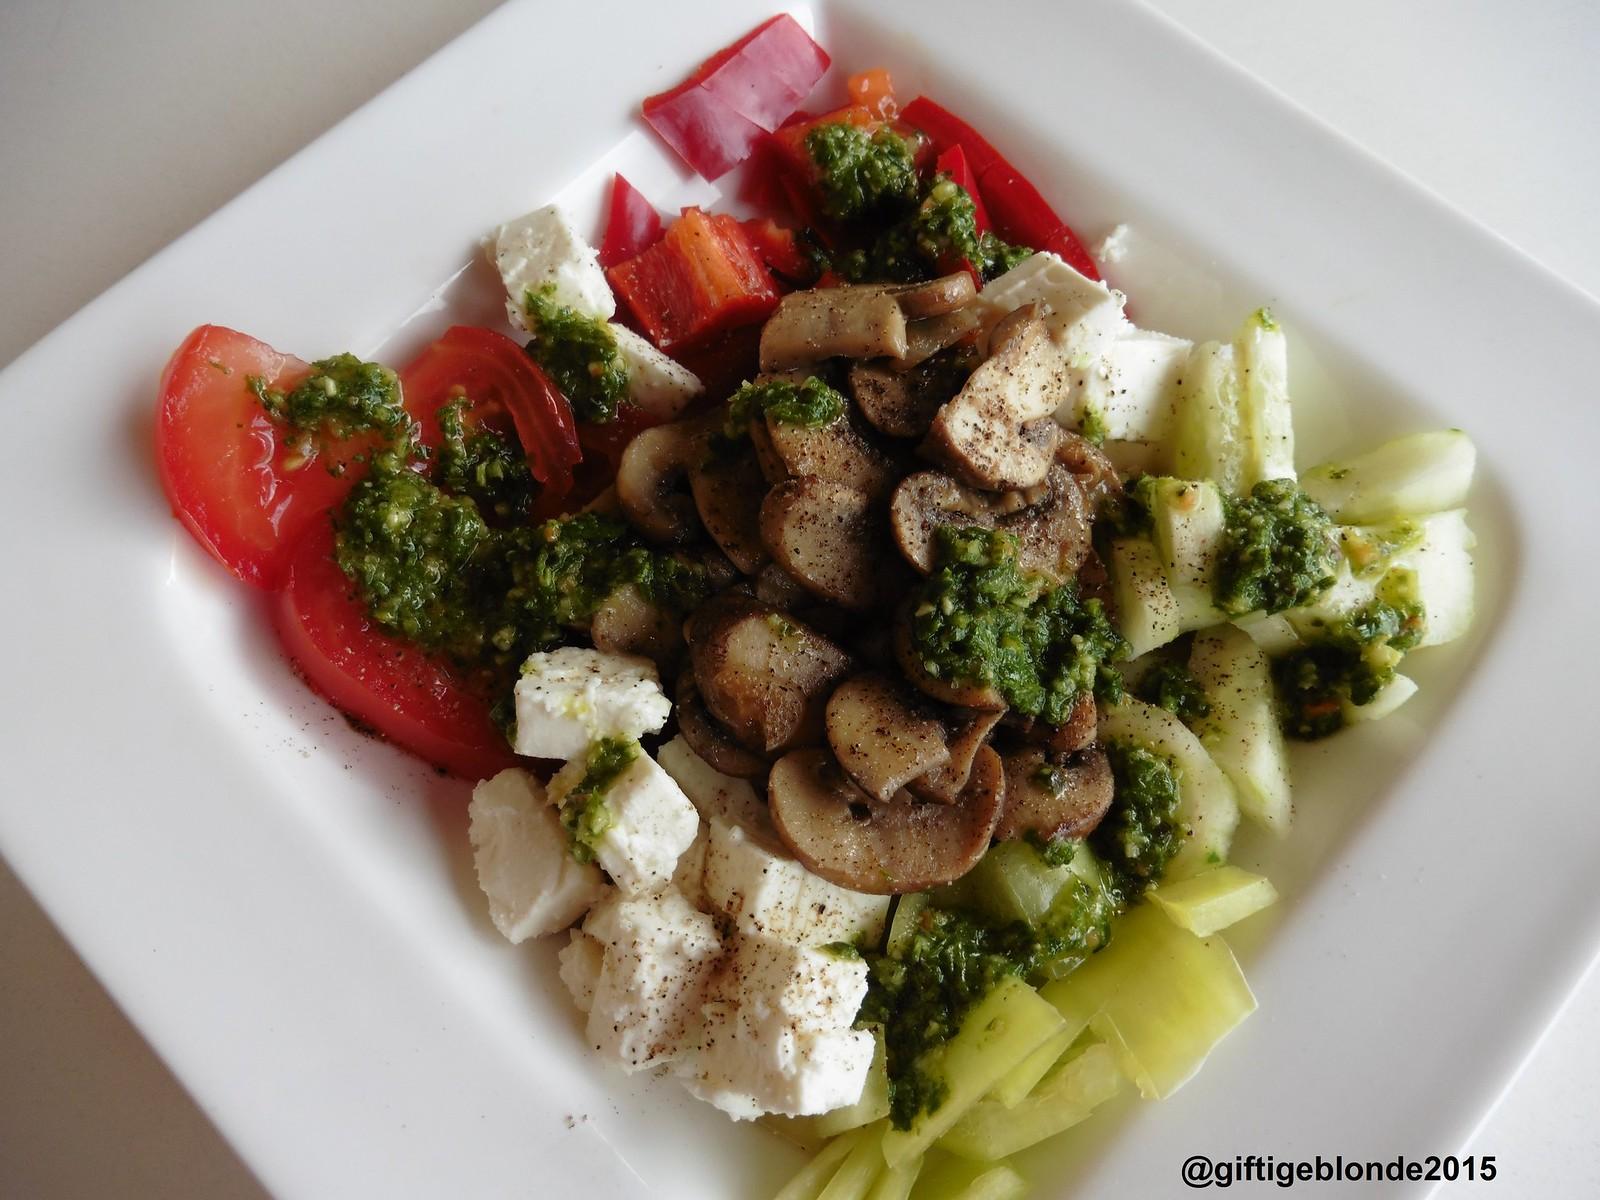 Bunter Salat mit Feta und braunen Champignons, Kräuterdressing